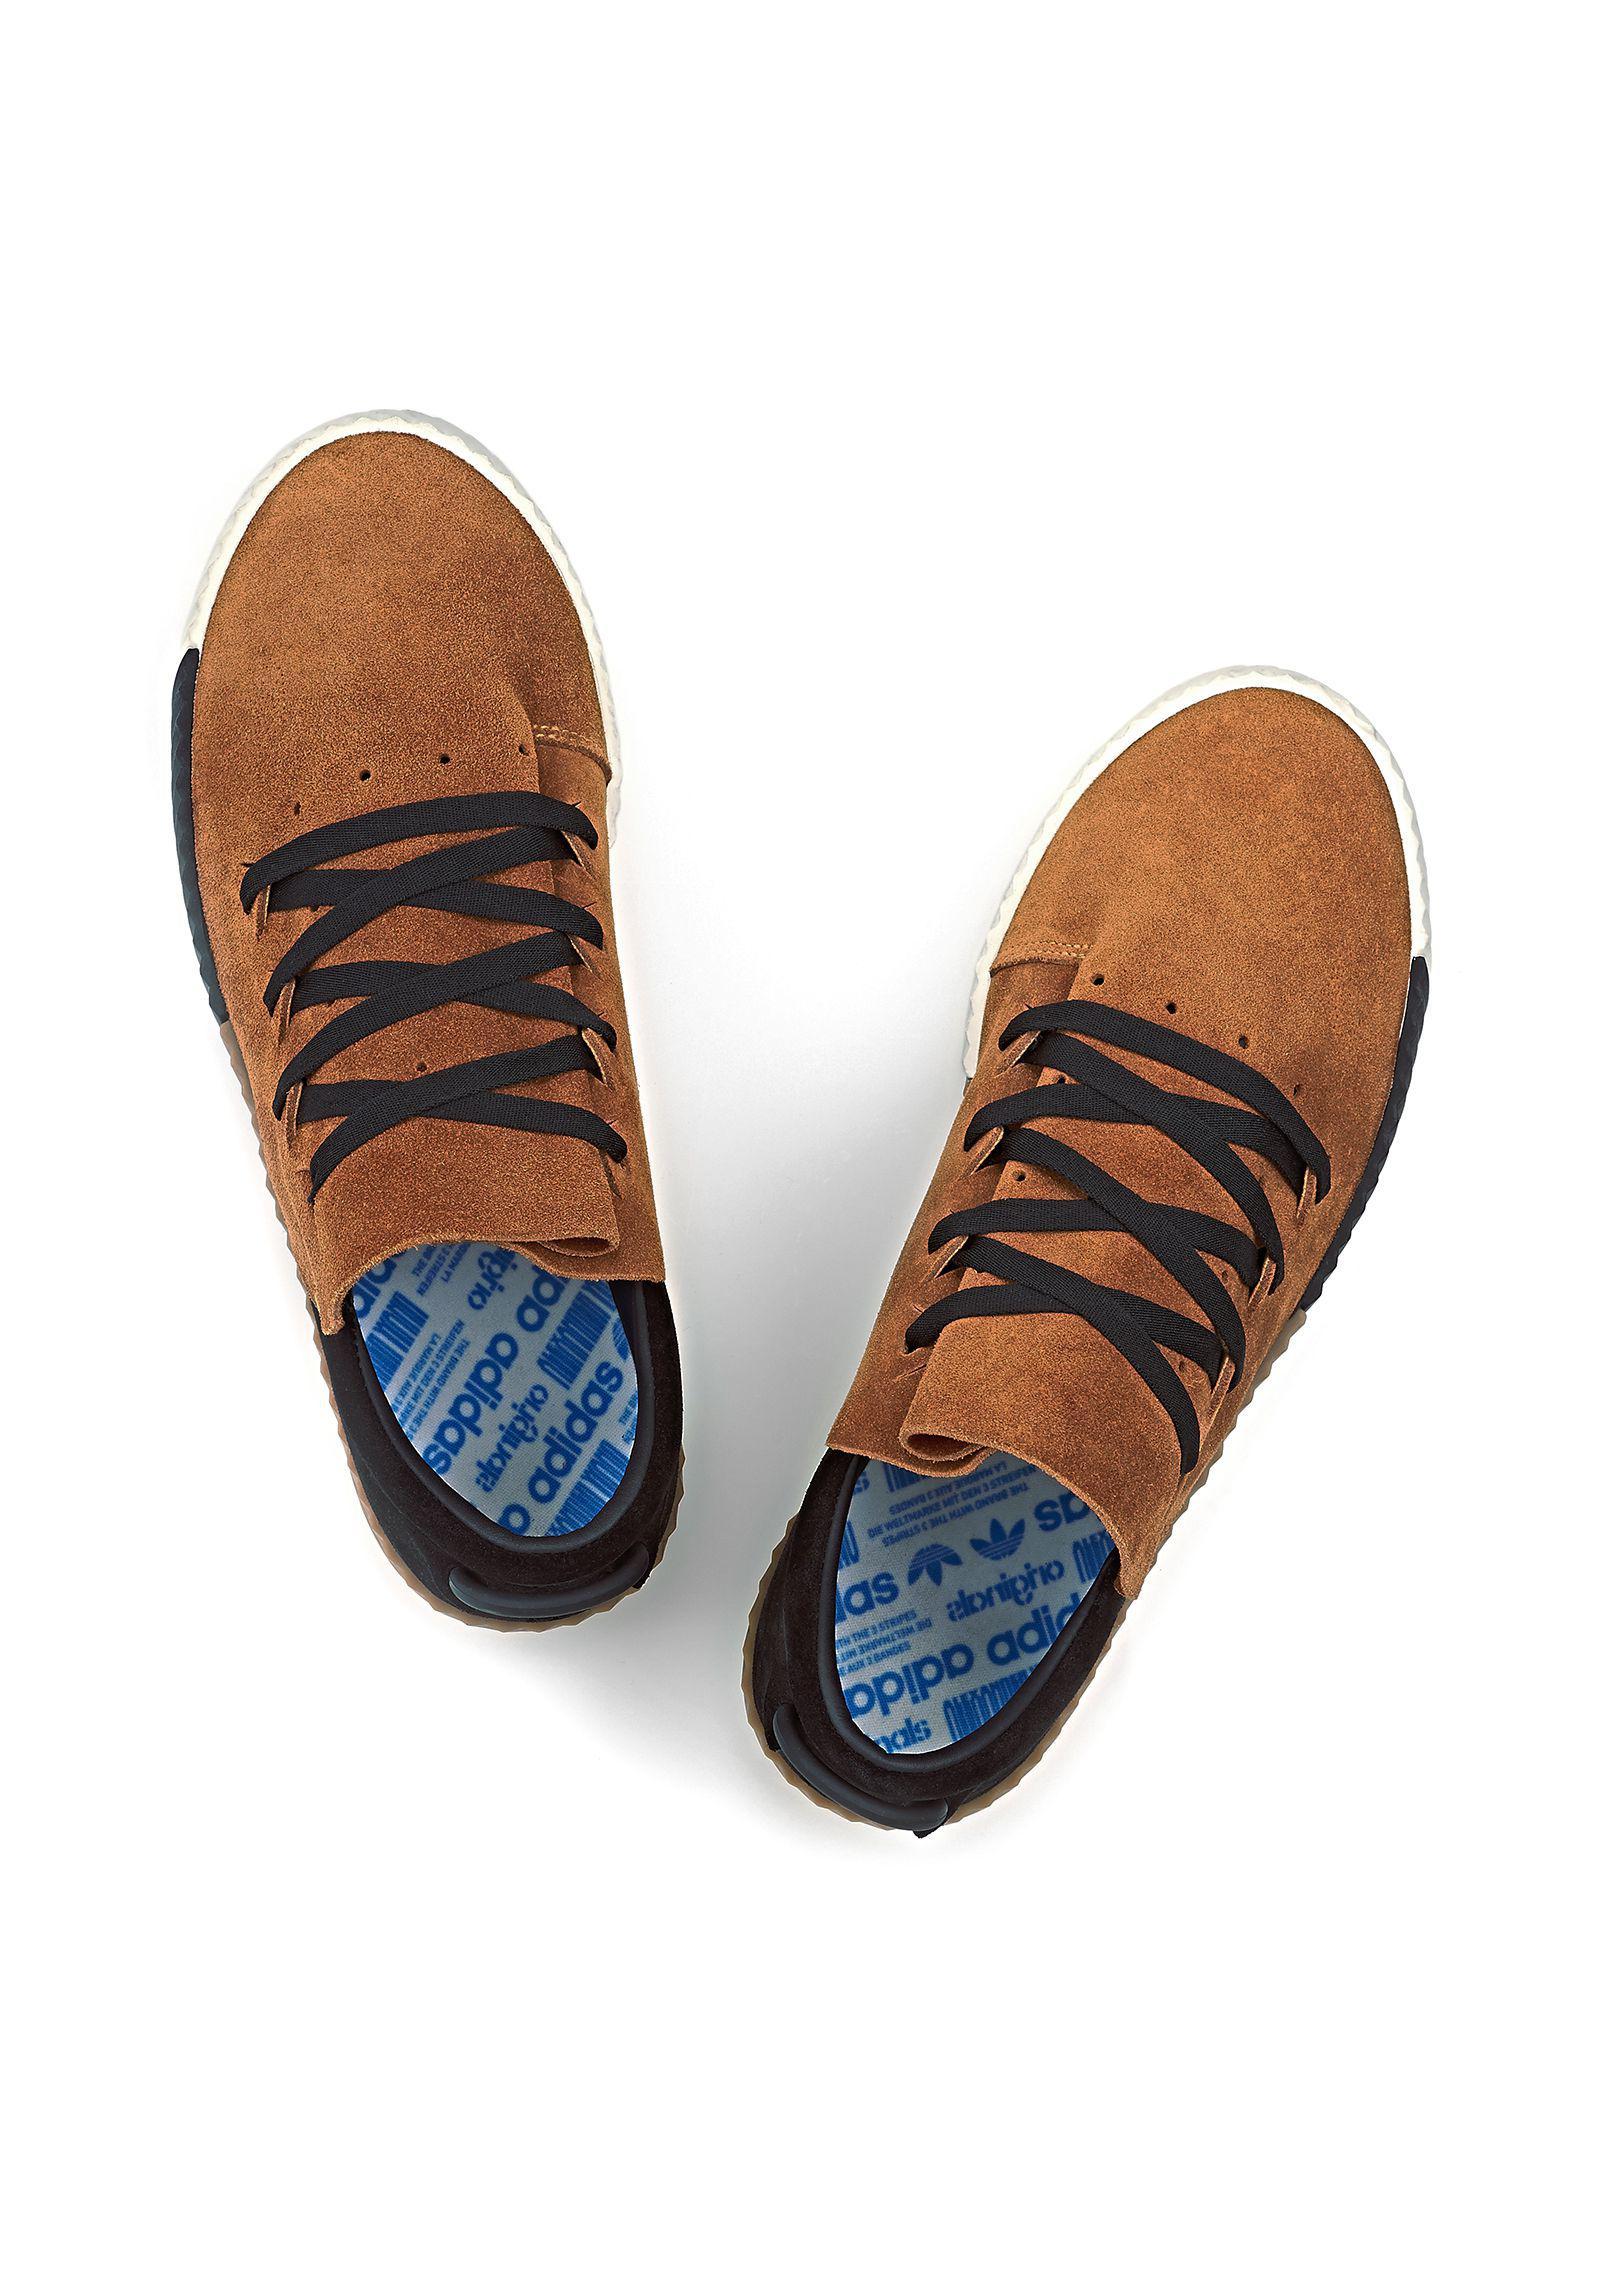 Lyst - Alexander Wang Adidas Originals By Aw Skate Shoes 25252b431